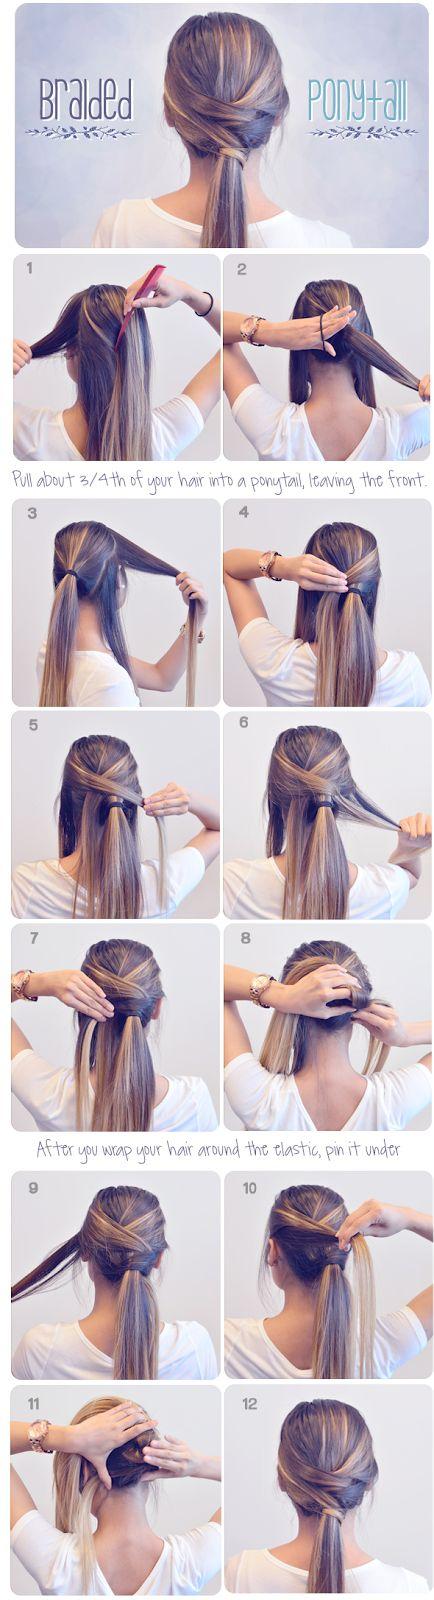 How To Make Braided Ponytail - Tutorial ~ Entertainment News, Photos & Videos - Calgary, Edmonton, Toronto, Canada